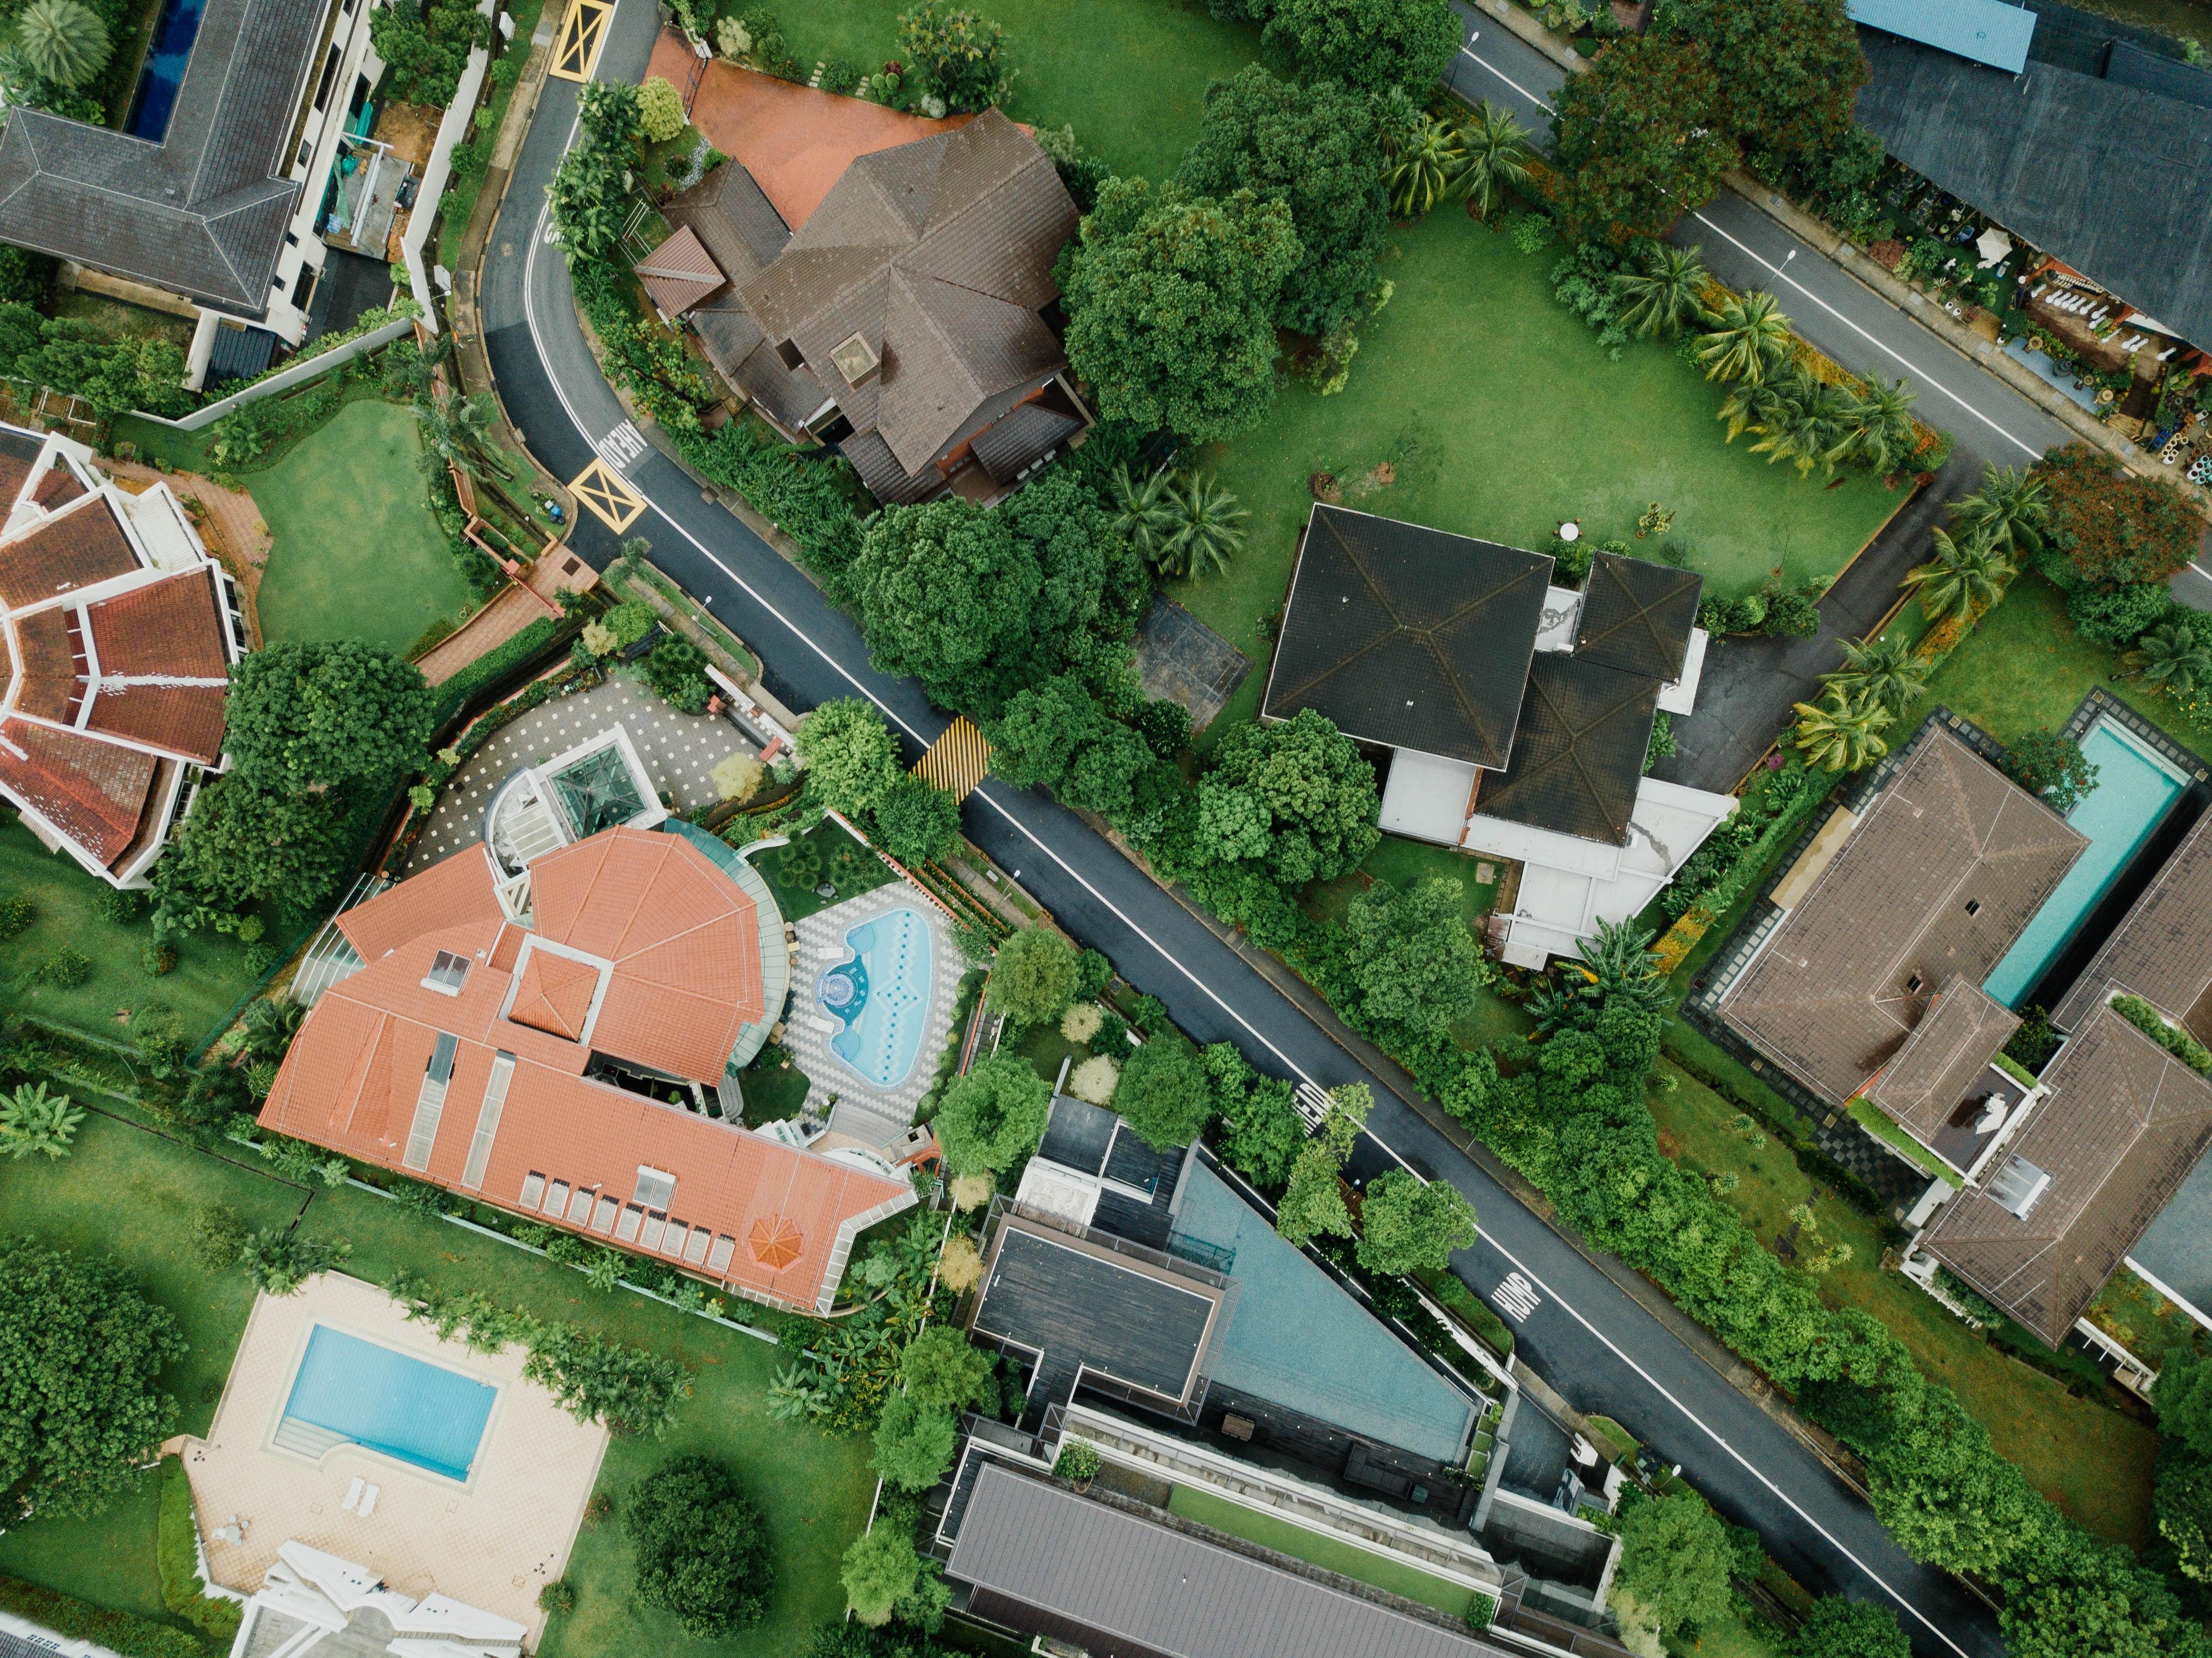 aerial view of village